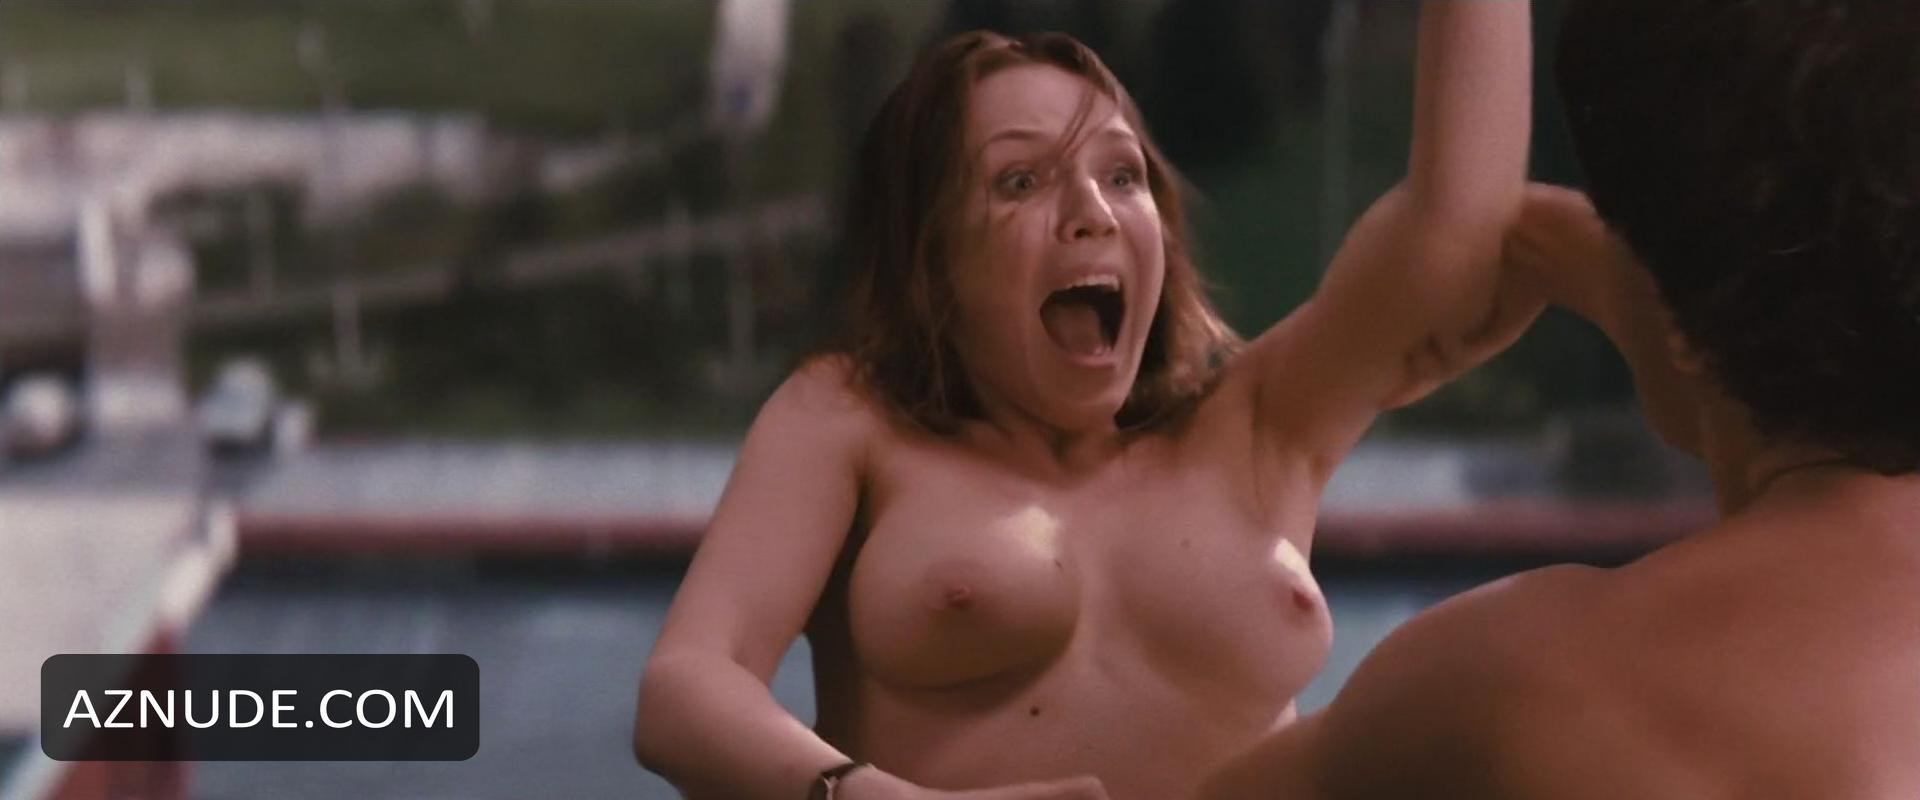 pantyhose image anal sex pics